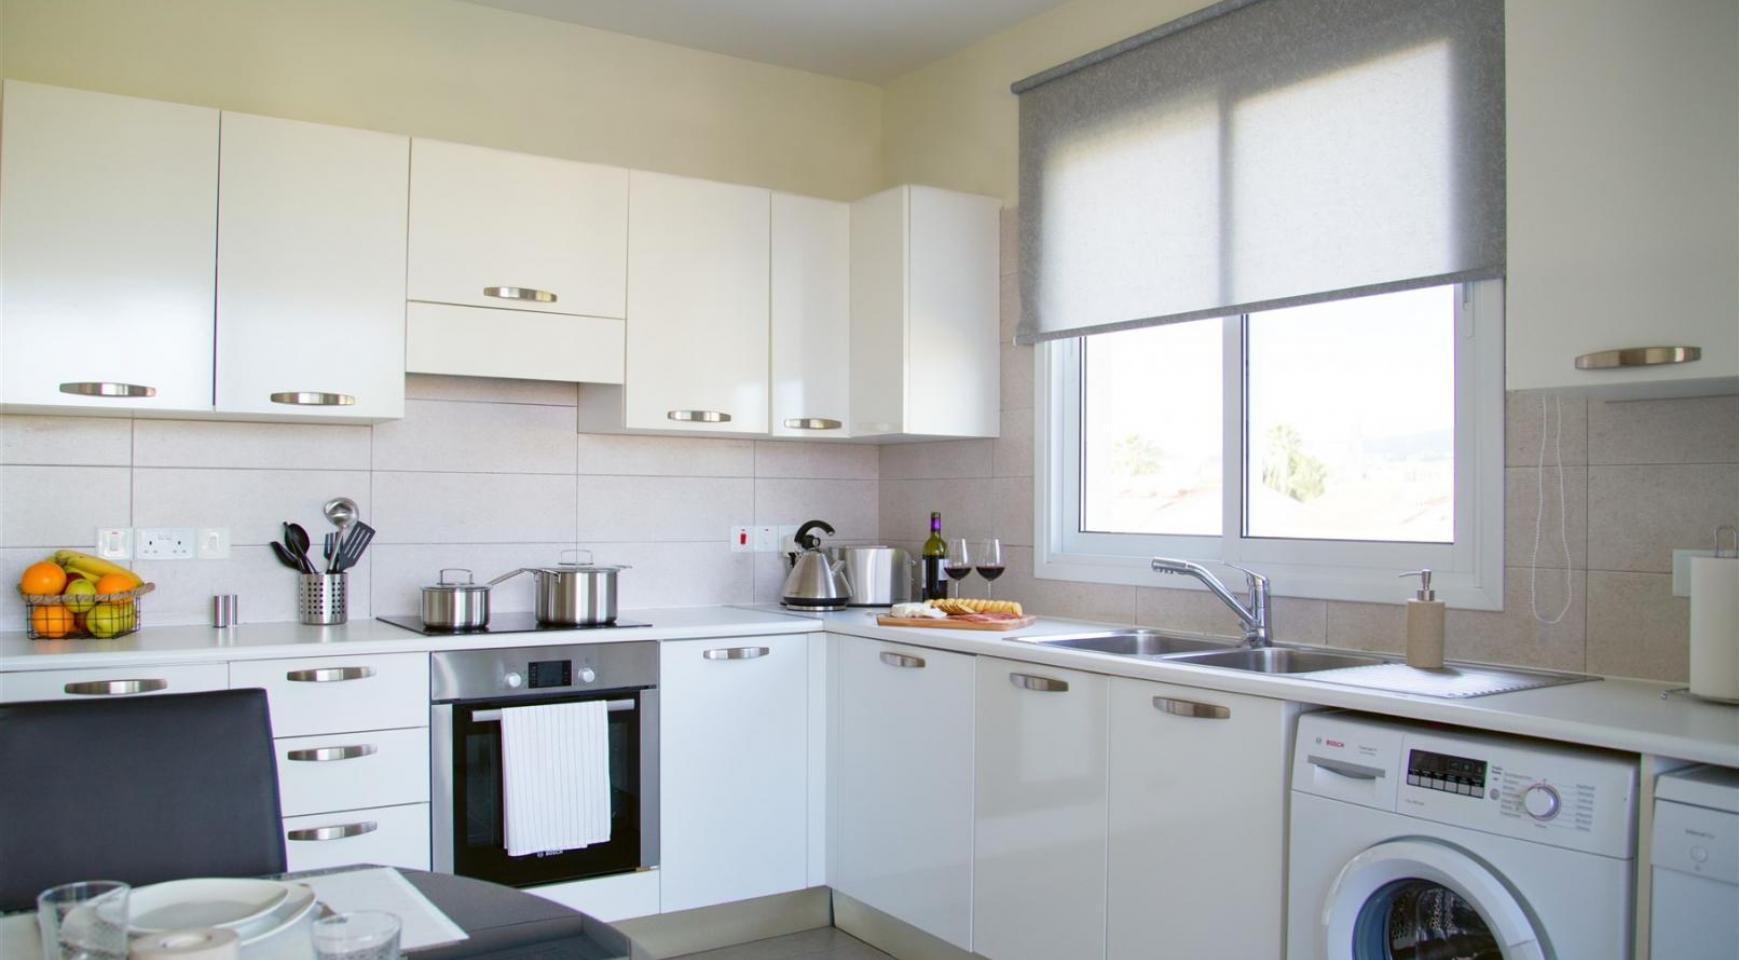 Luxury 2 Bedroom Apartment Christina 301 in the Tourist Area - 12